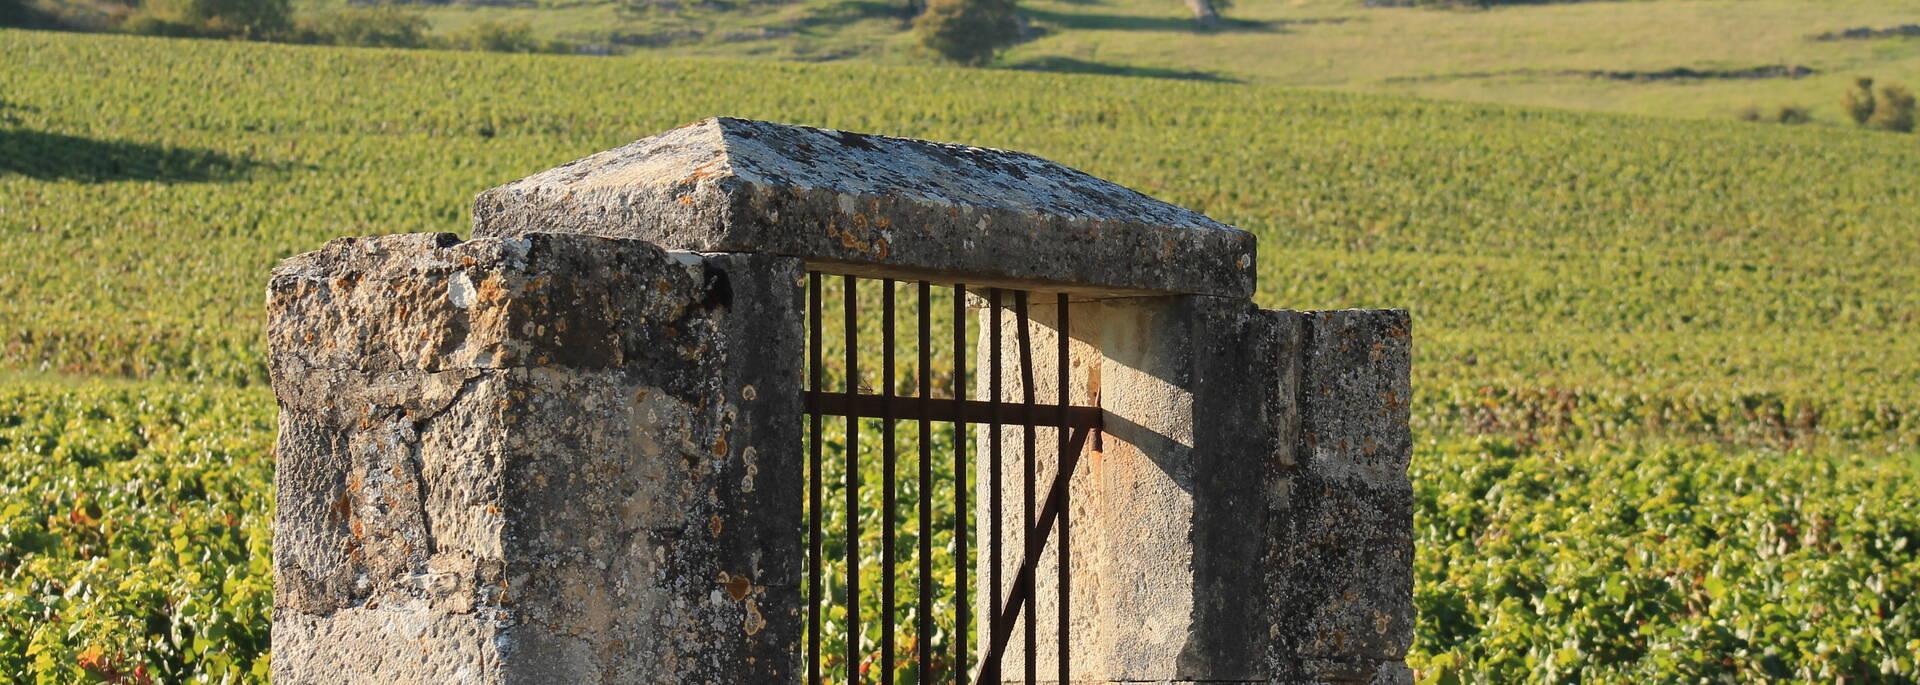 Entrée clos viticole Givry